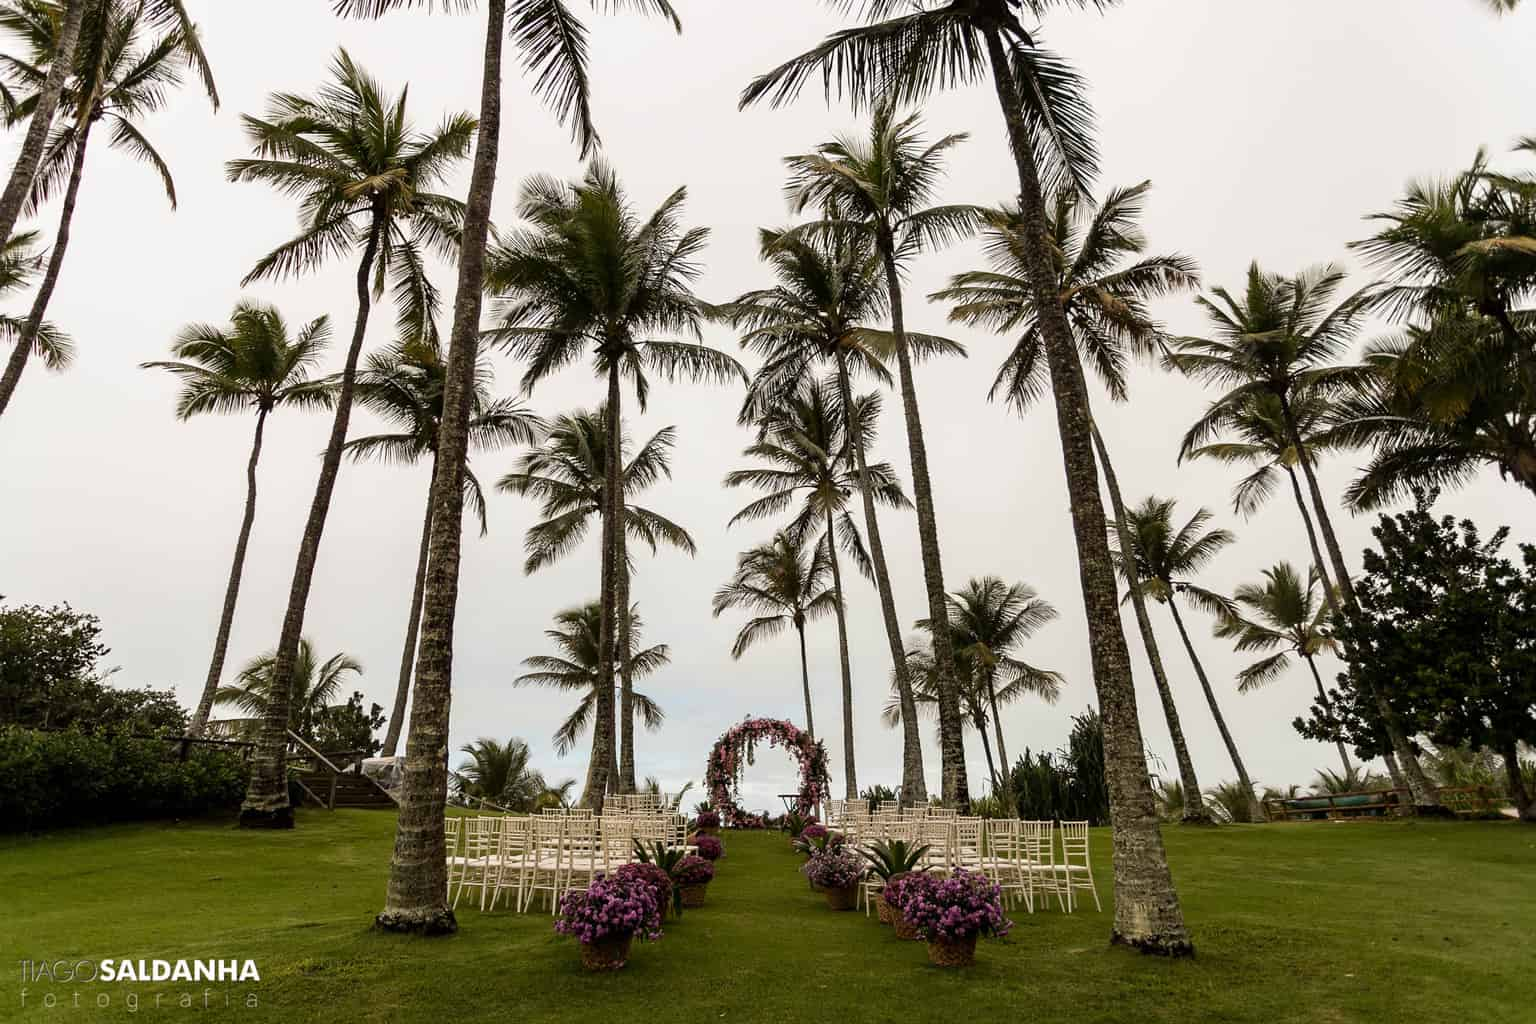 Casamento-Chandrélin-e-Laureano-Chan-e-Lau-decoracao-da-cerimonia-decoracao-Defluer-Guta-Gula-Hotel-Rio-da-Barra-tiago-saldanha-Trancoso76